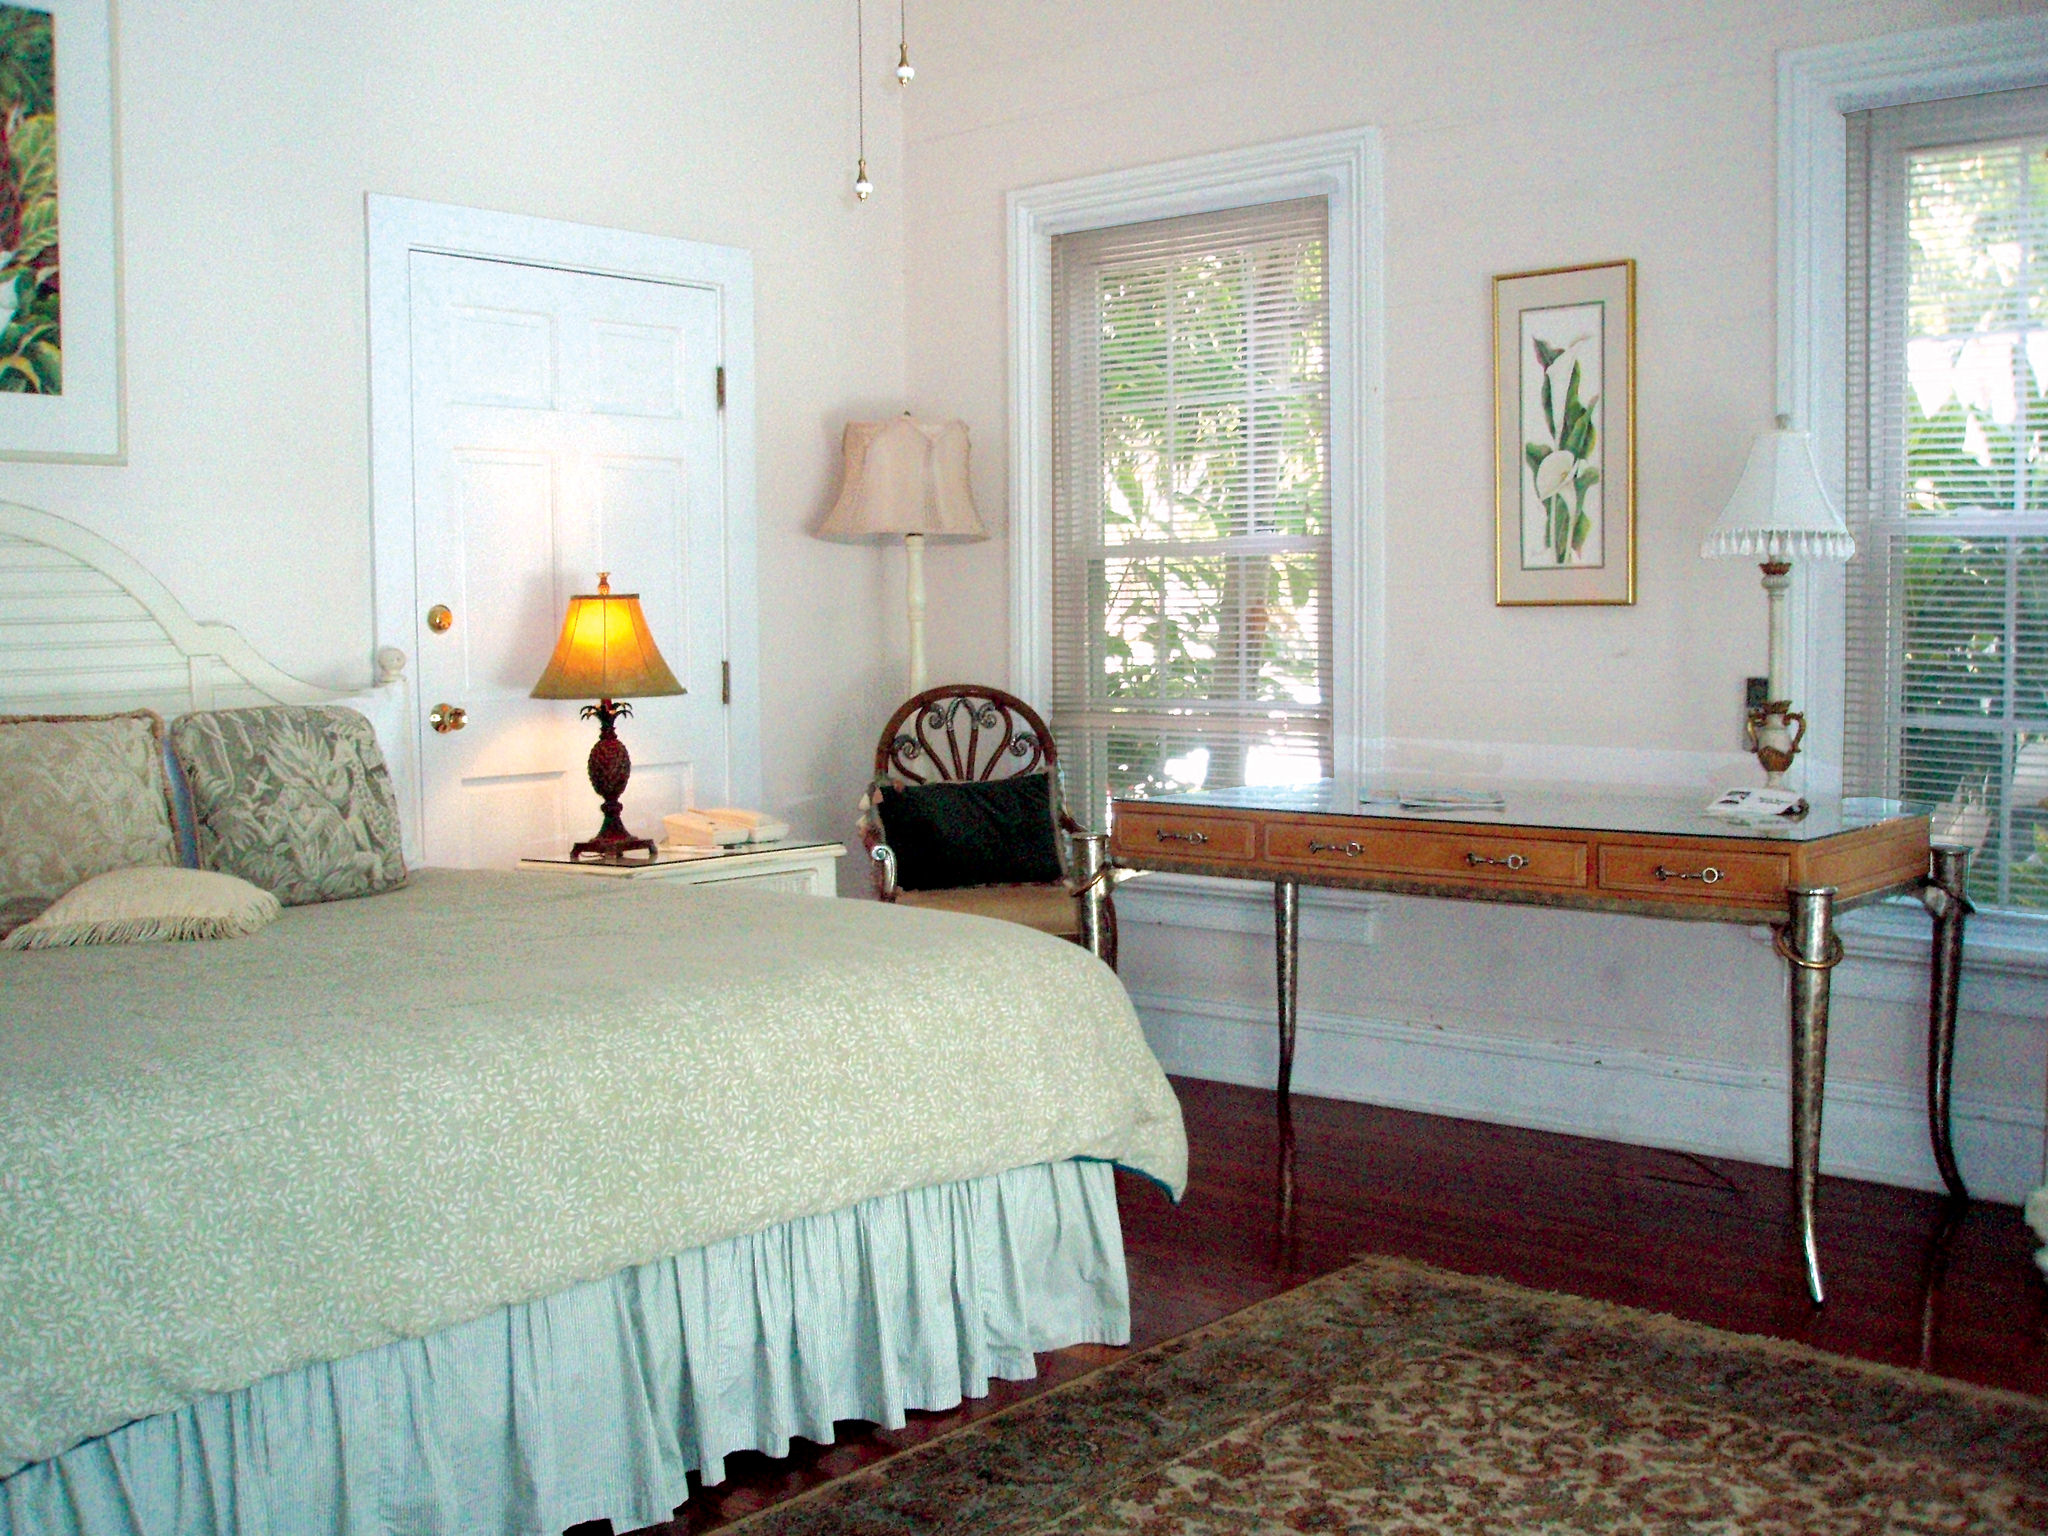 ambrosia-guest-house-room.jpg